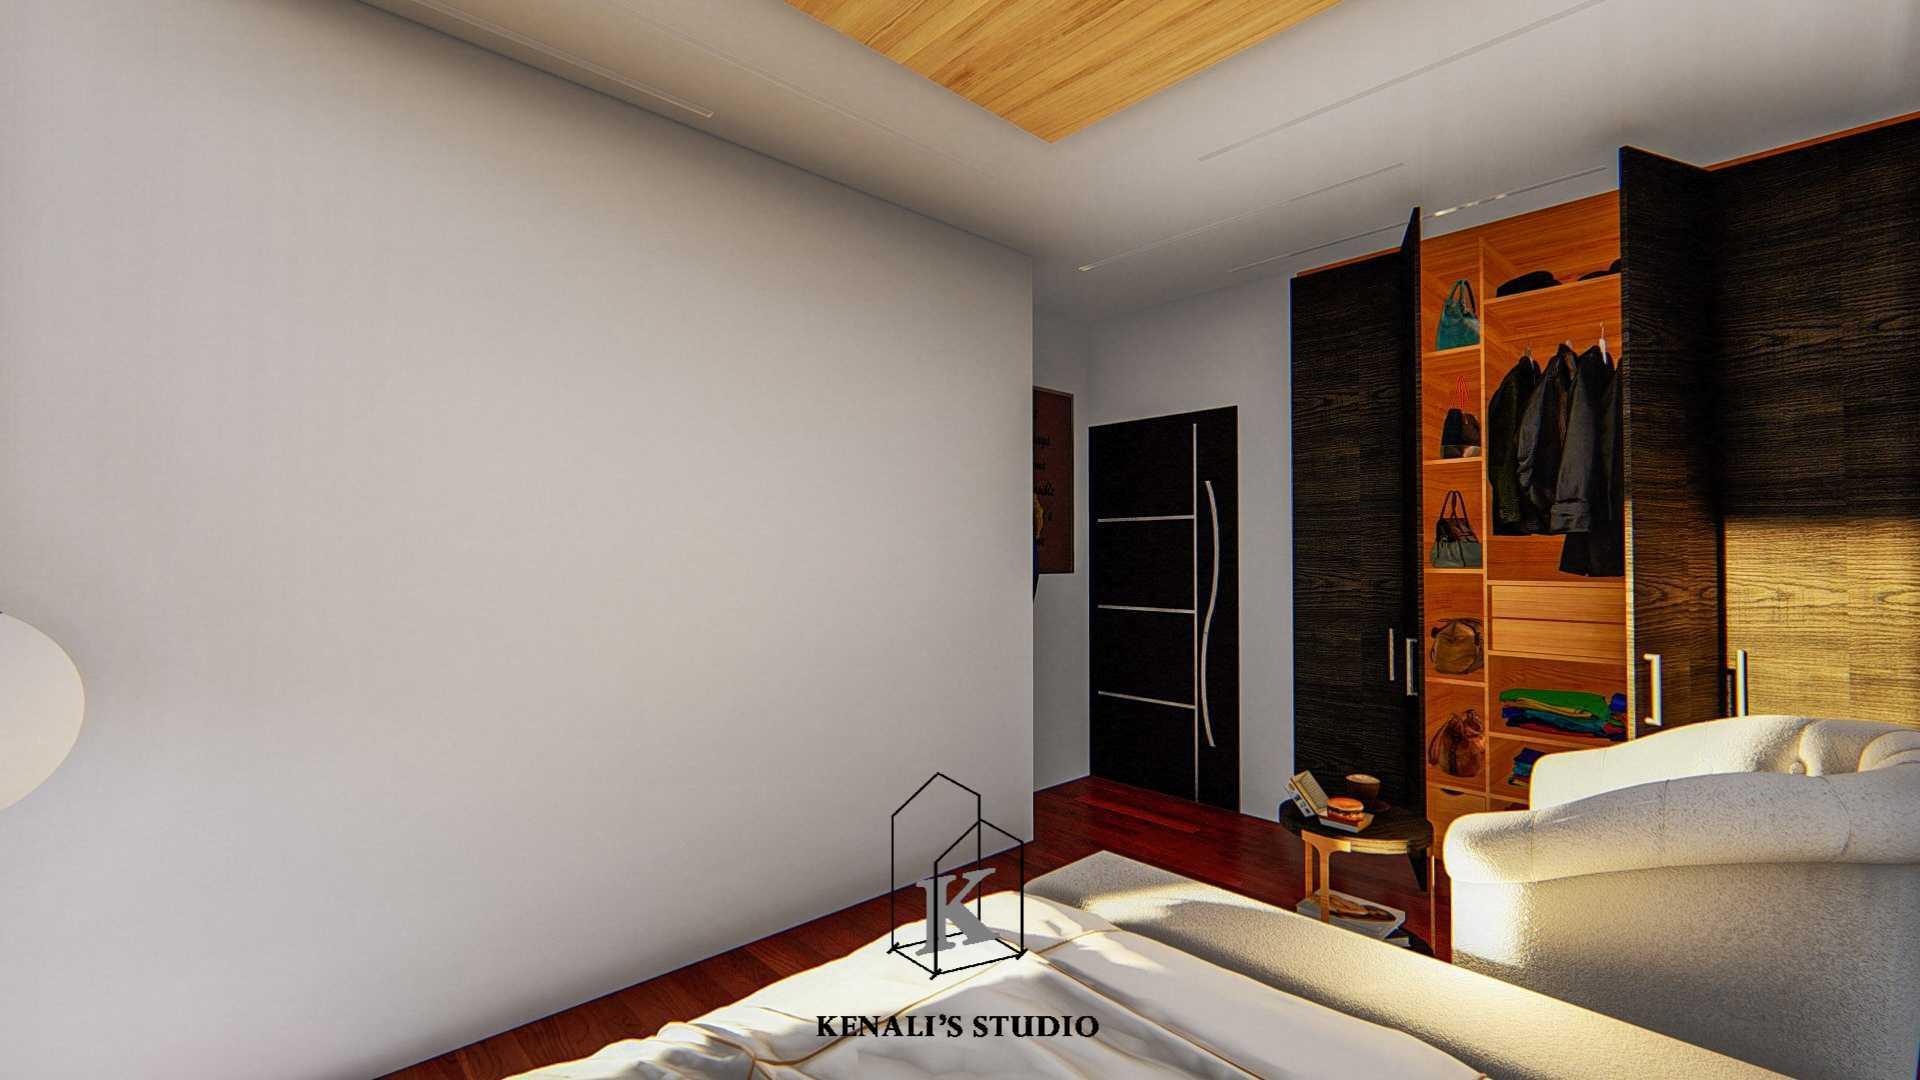 Kenali's Studio Project : Lowlit Bedroom Italia Italia Kenalis-Studio-Project-Lowlit-Bedroom   72927